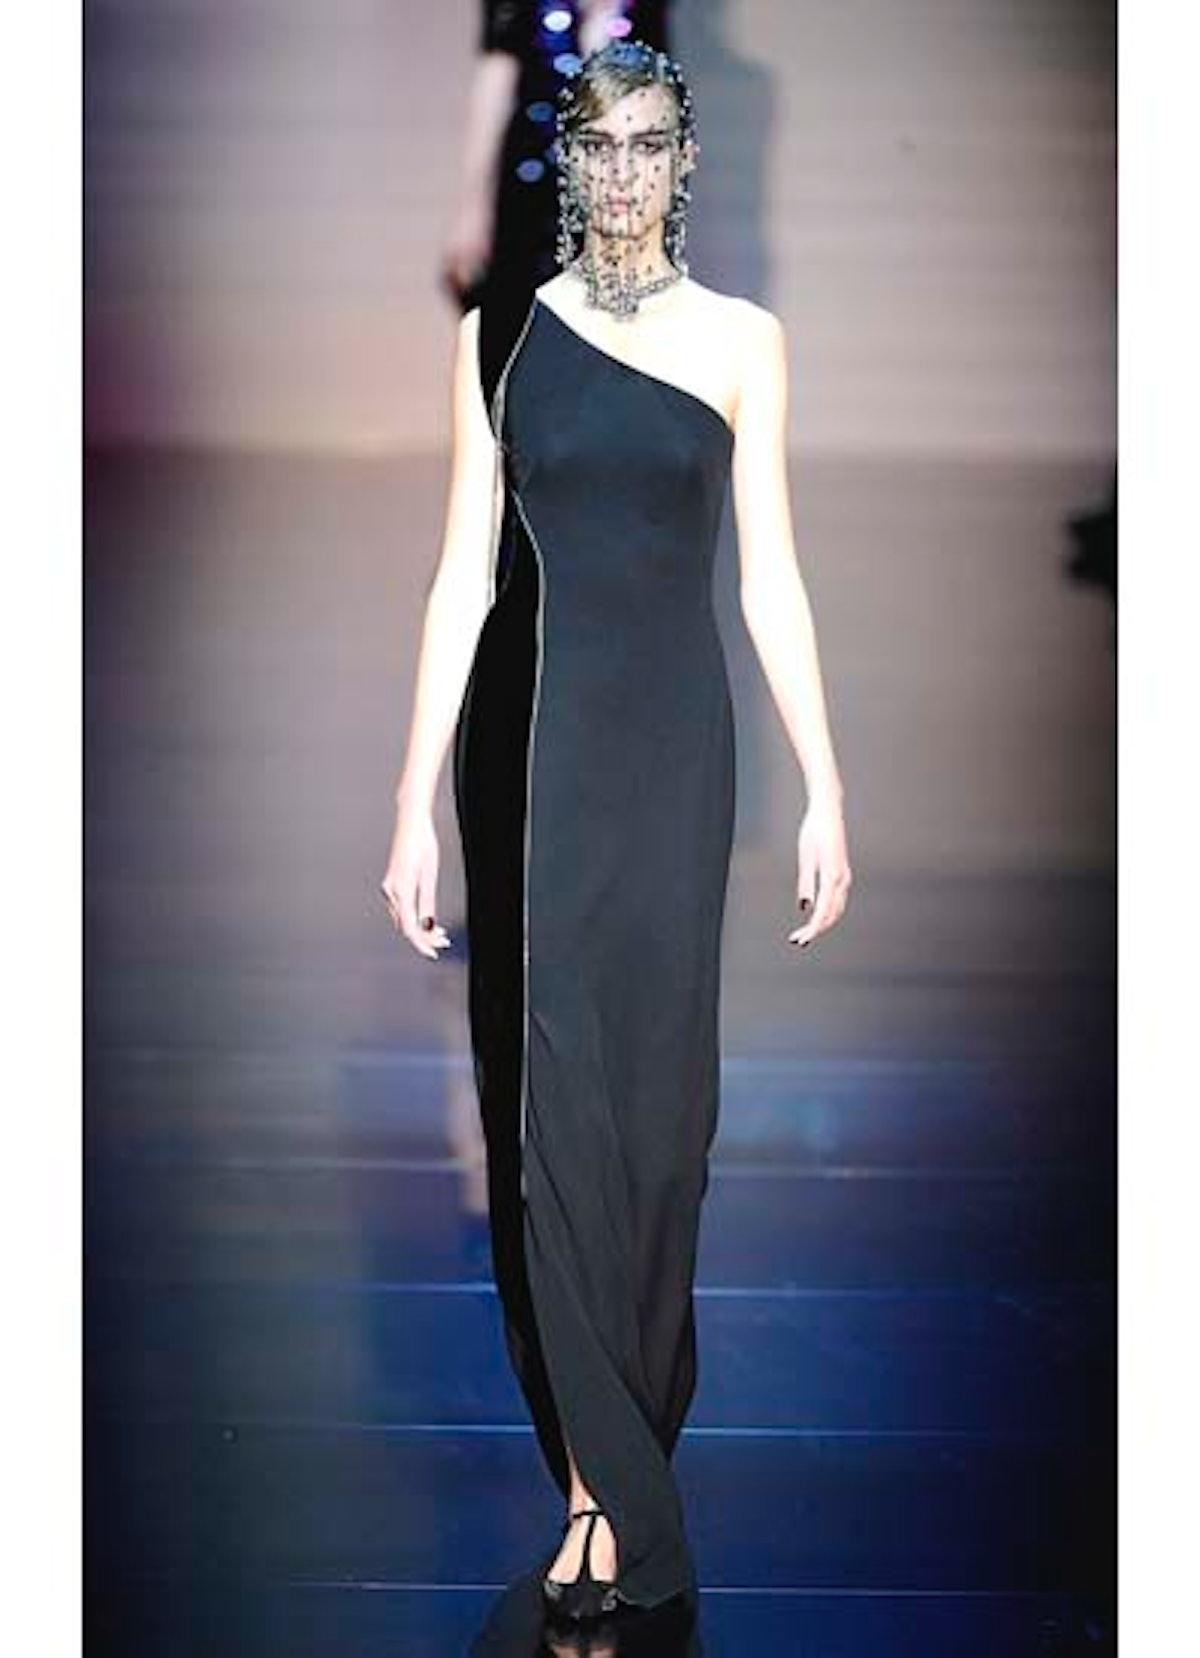 fass-giorgio-armani-couture-2012-runway-34-v.jpg